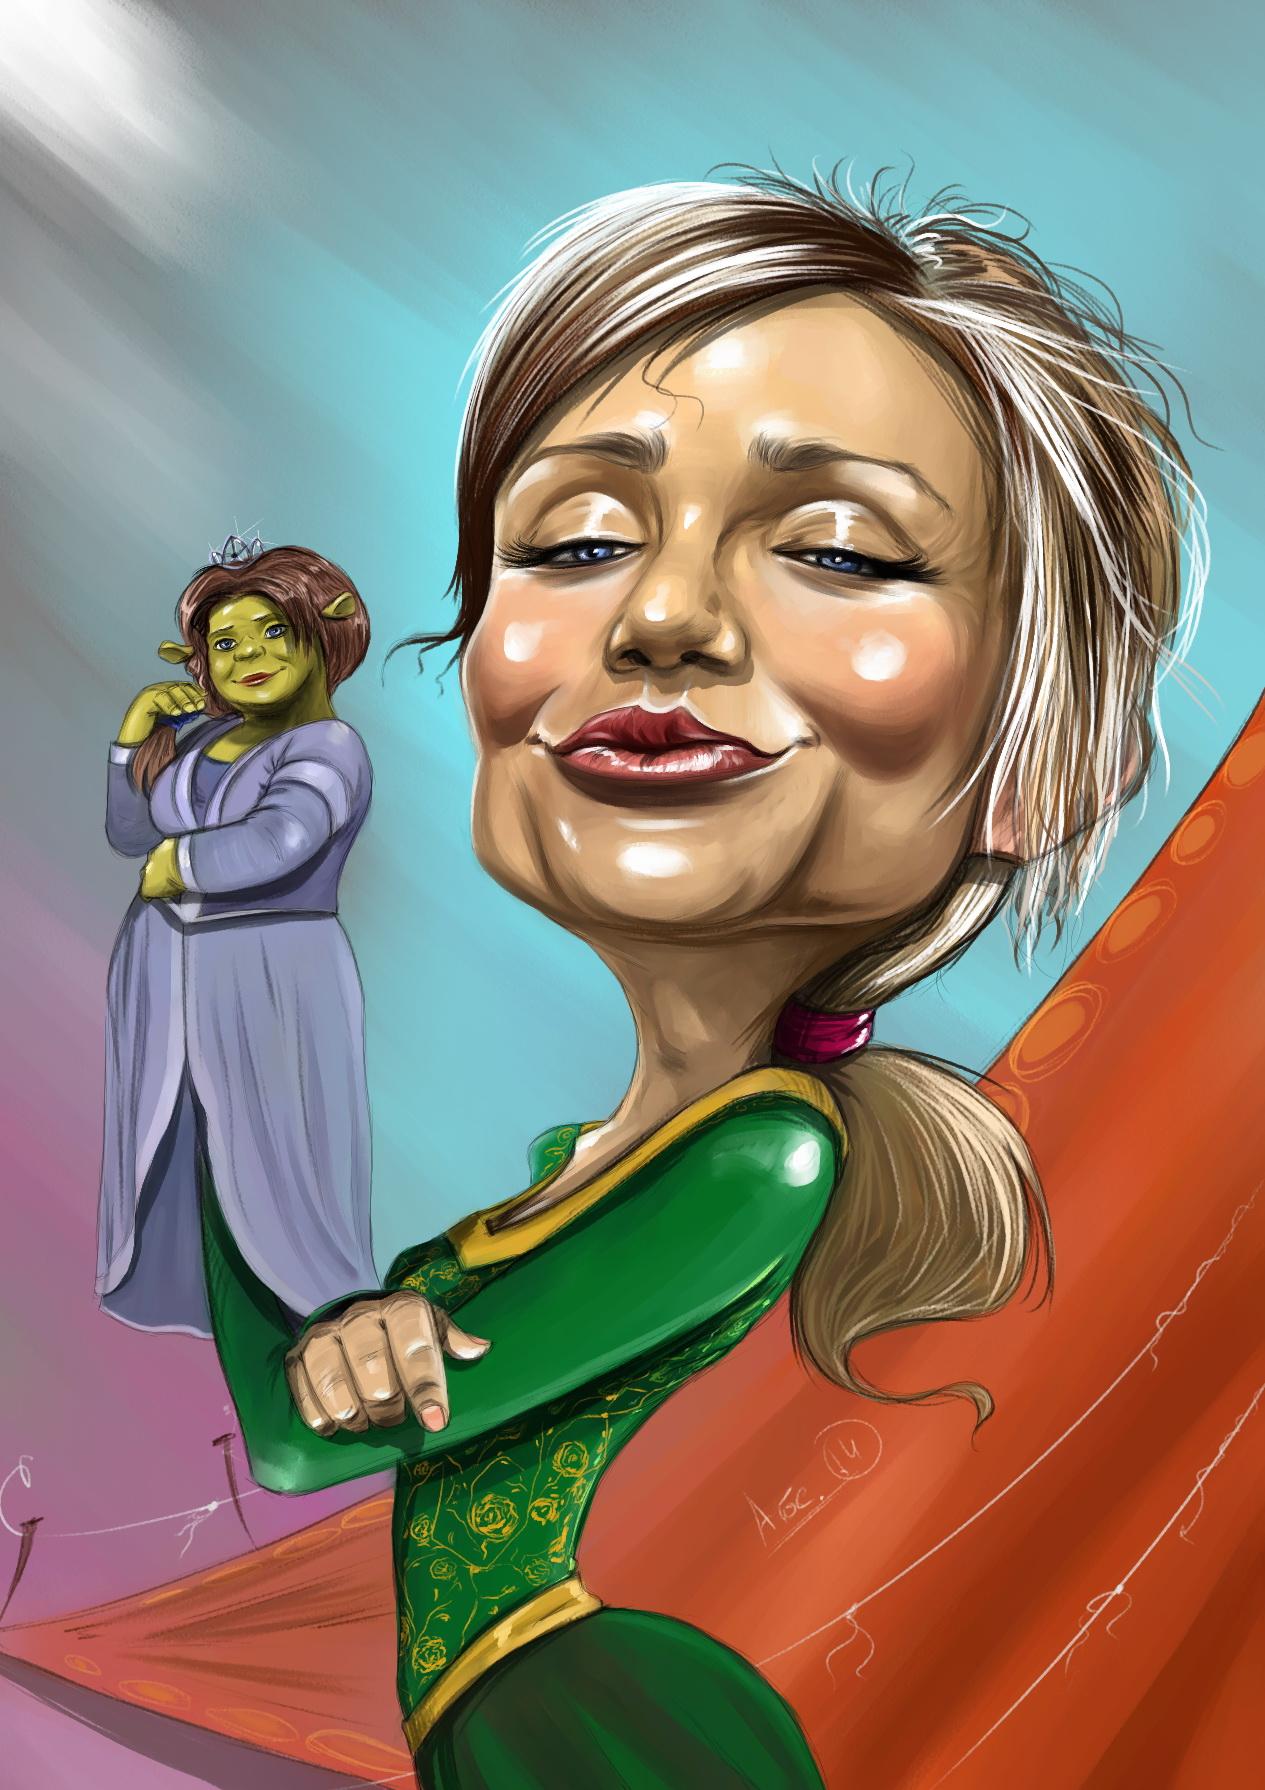 Cameron Diaz - Caricature